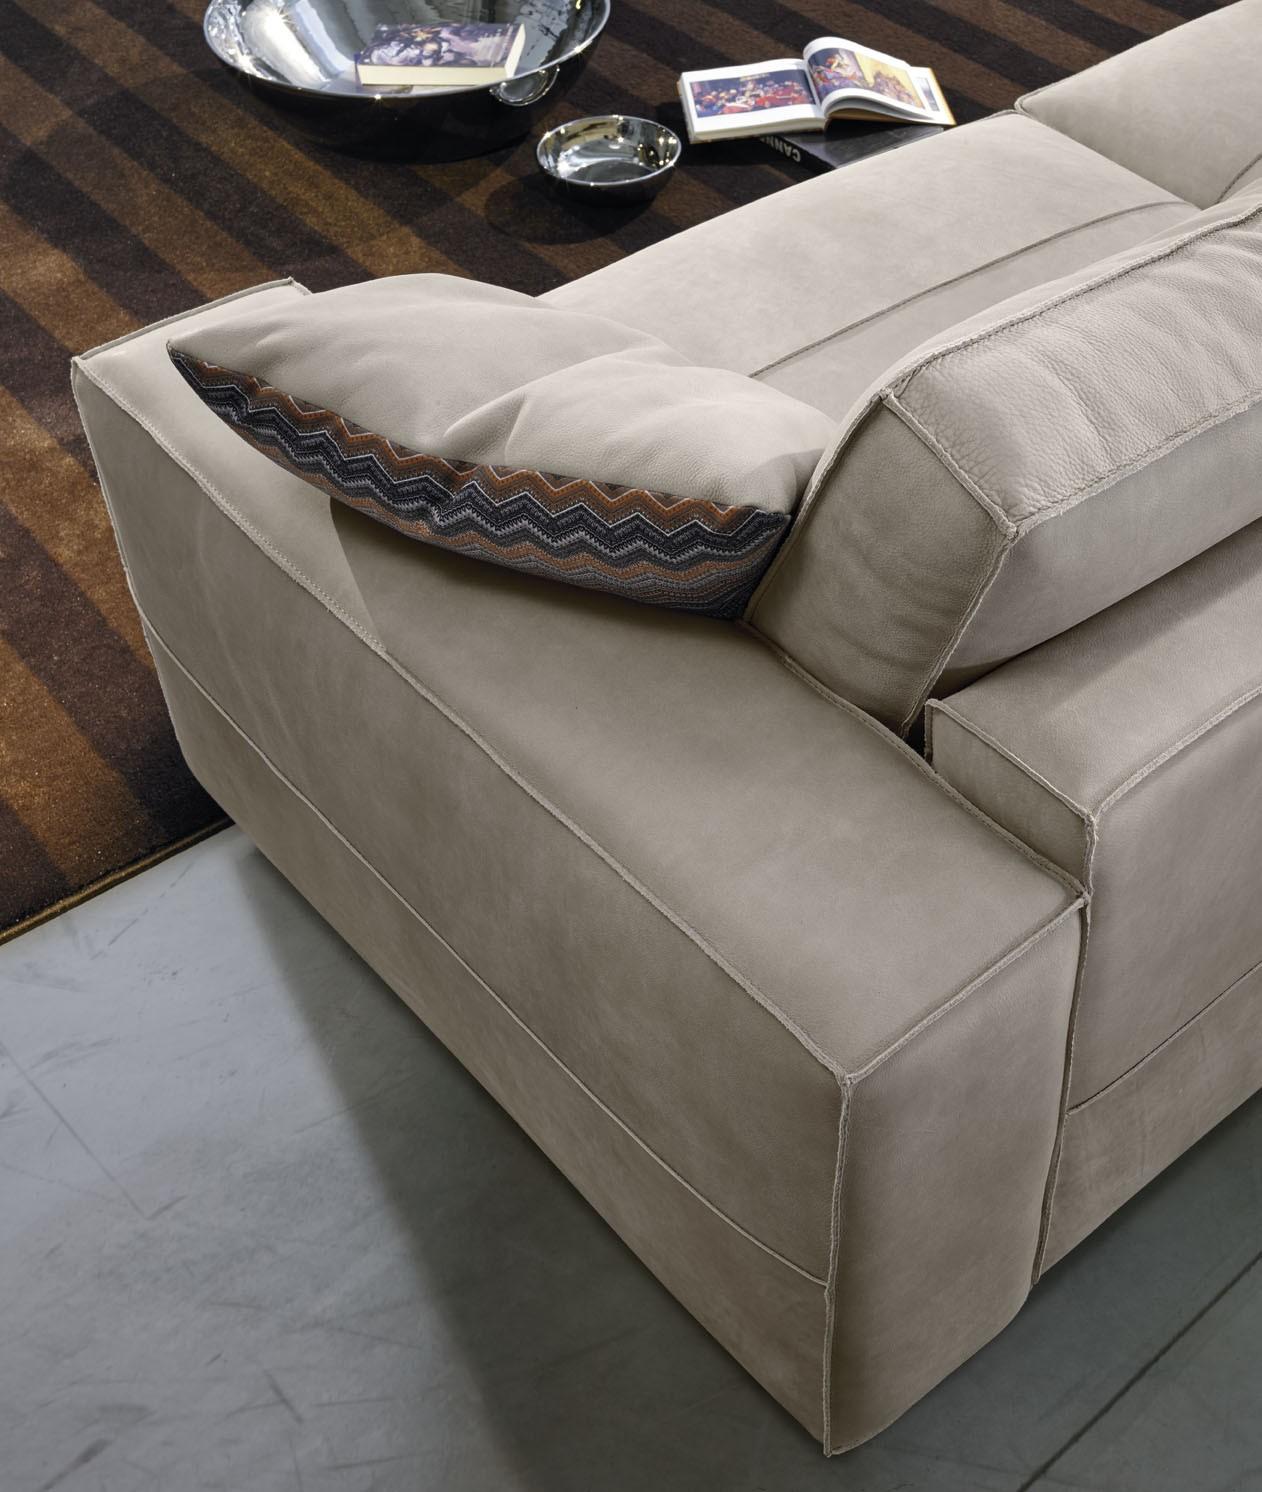 gamma sofas dwr twilight sleeper sofa craigslist carnaby by international in boston nova interiors